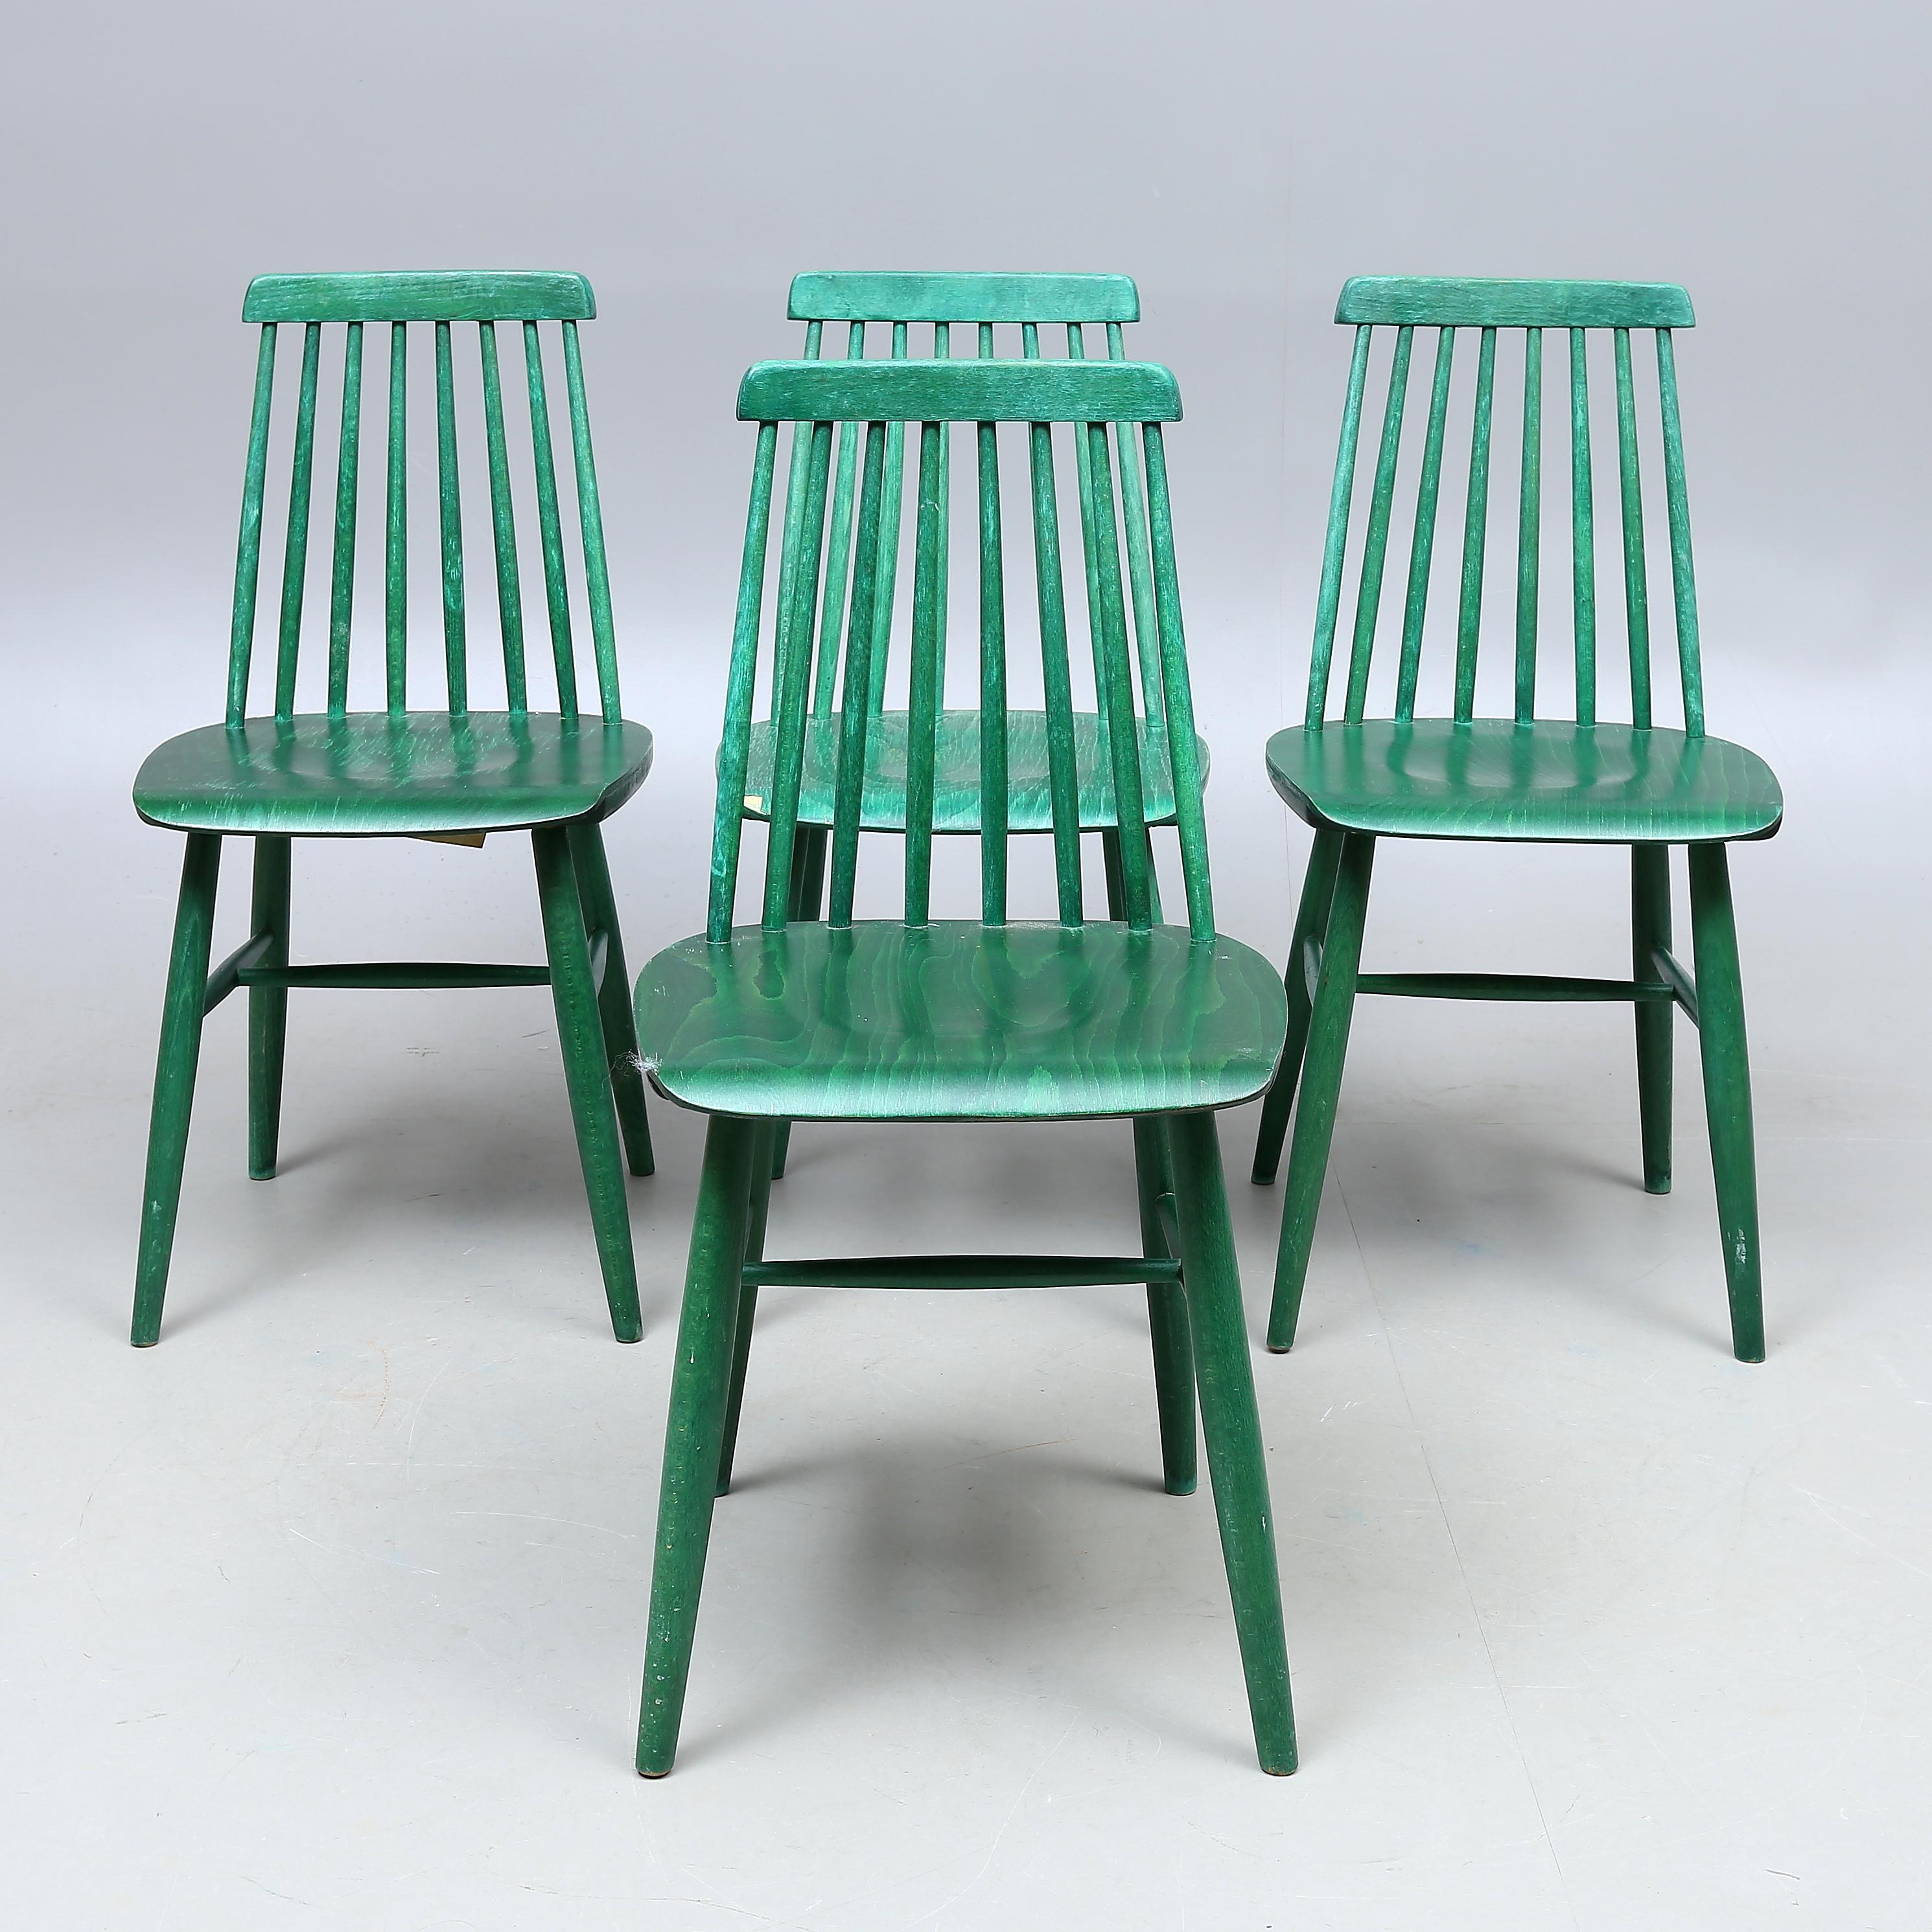 2 Stolar, Ikea Preben | Barnebys